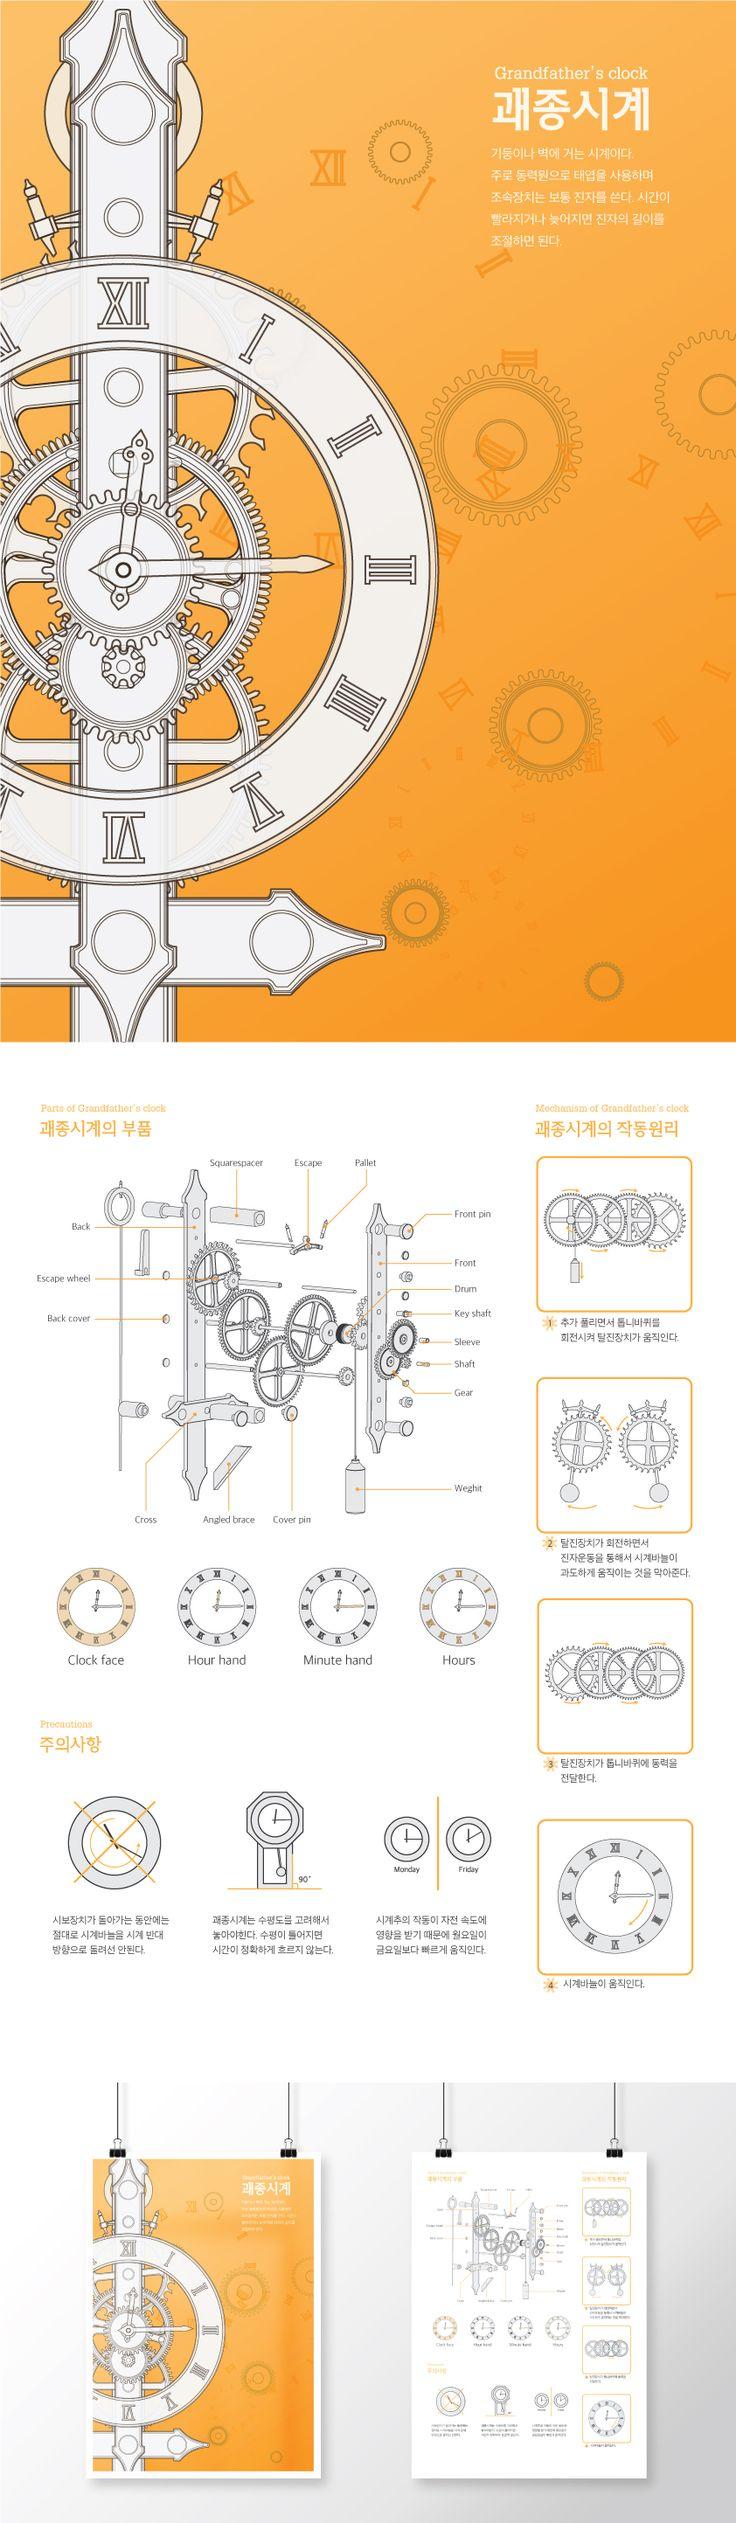 Dae Kyo Jeong│ Information Design 2015│ Major in Digital Media Design │#hicoda │hicoda.hongik.ac.kr